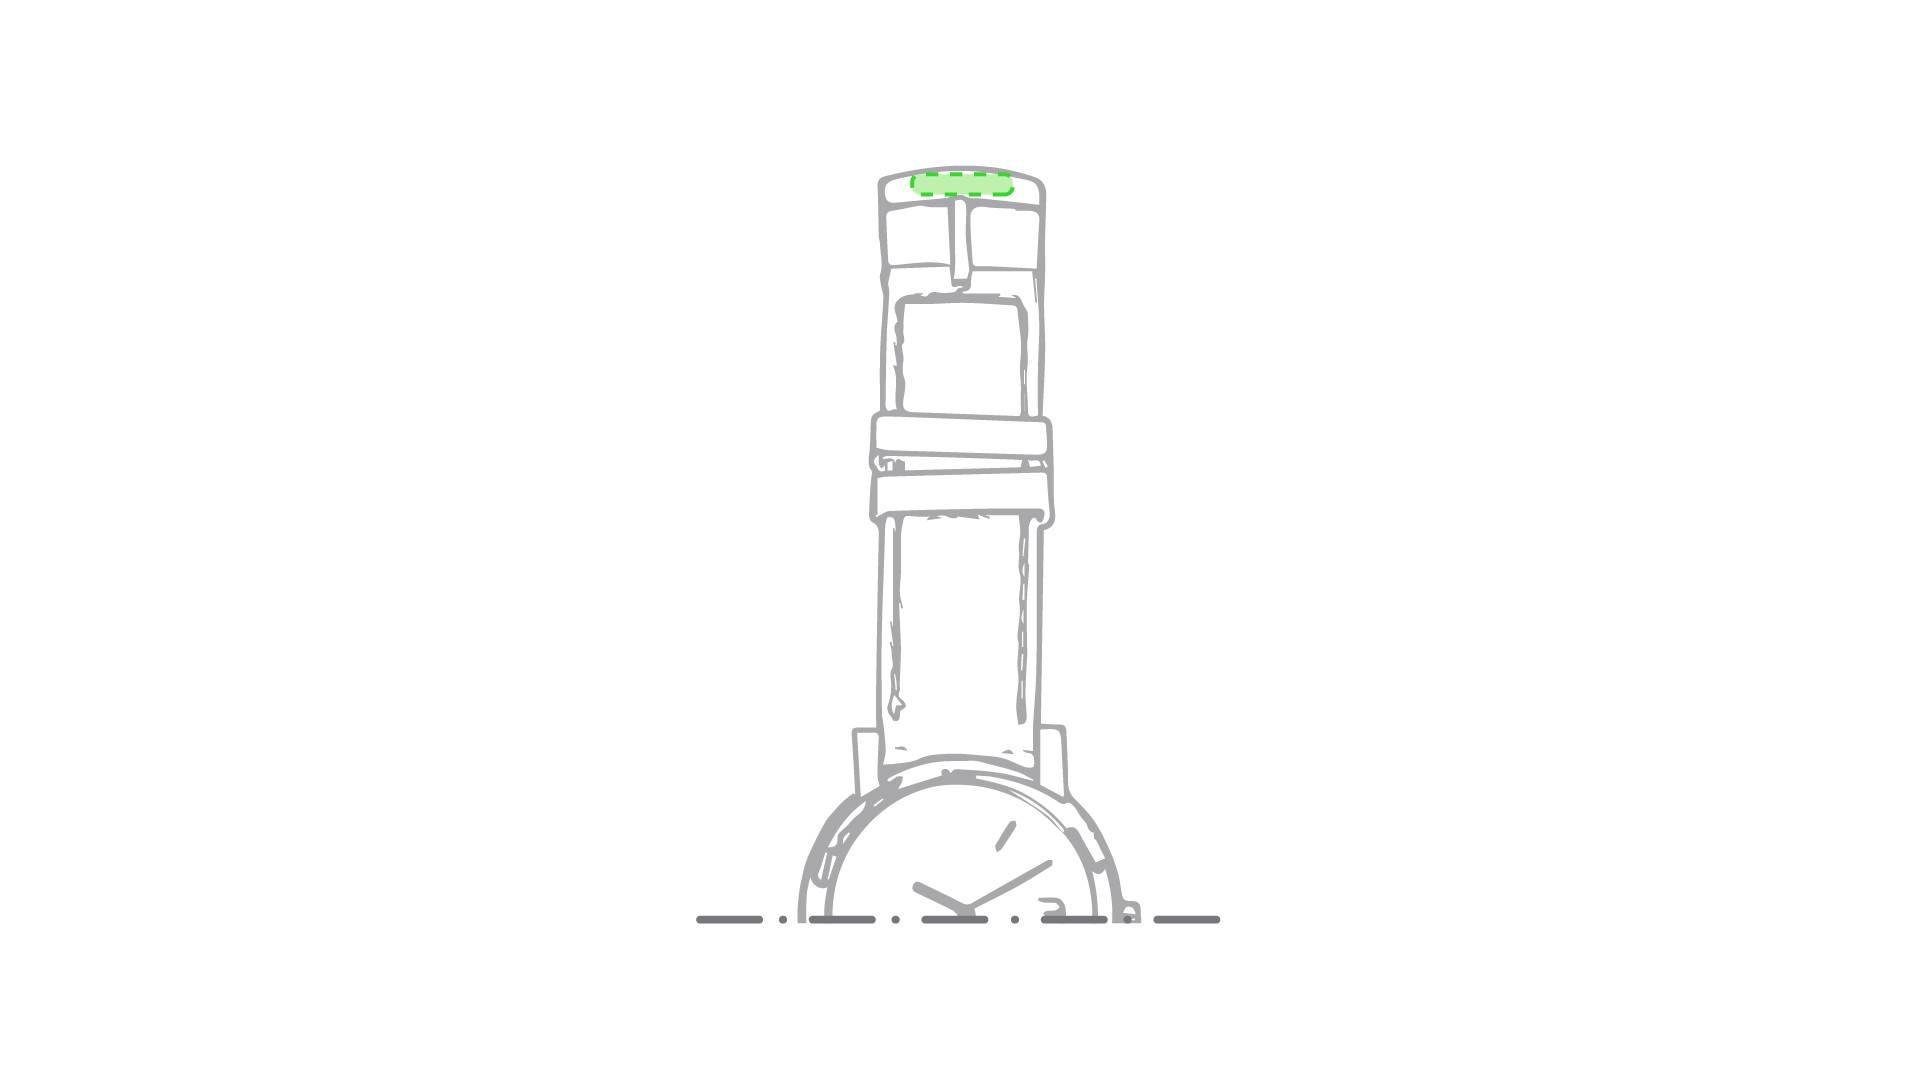 Reloj analógico con correa de silicona 2